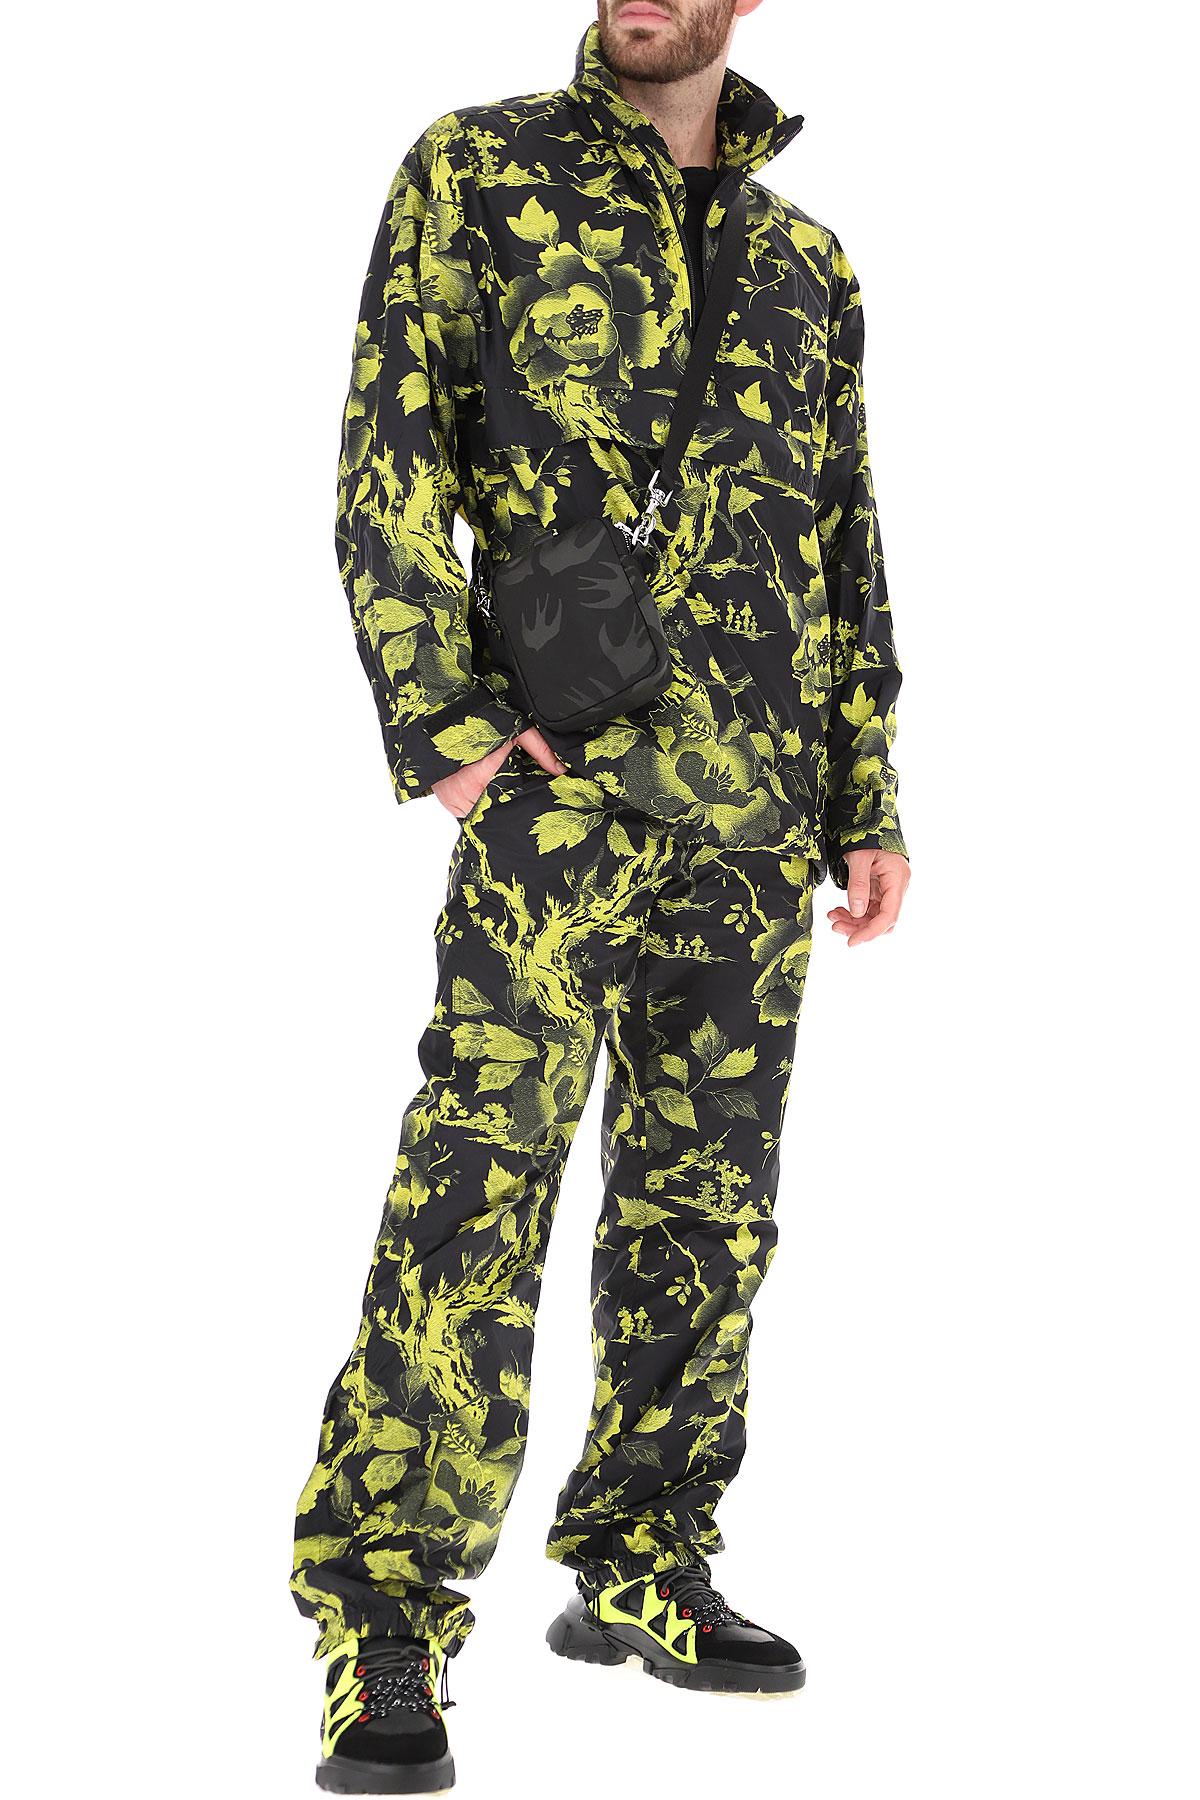 Alexander McQueen McQ Pants for Men On Sale, Black, poliammide, 2019, L M